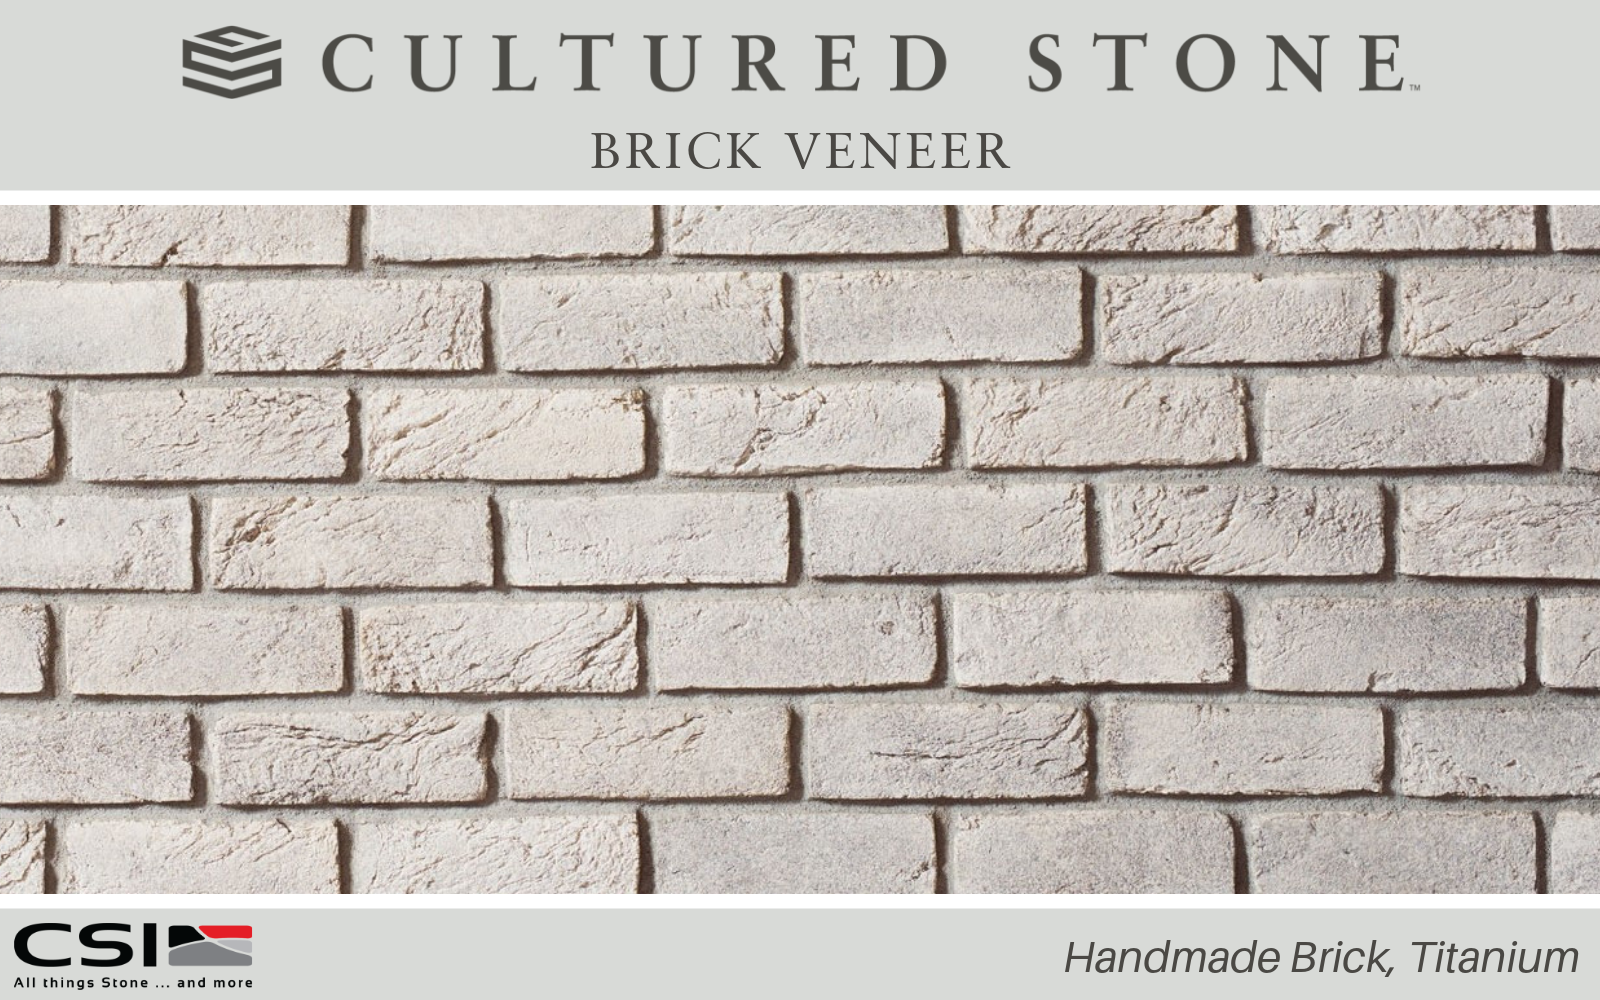 Handmade Brick From Cultured Stone Cultured Stone Brick Veneer Stone